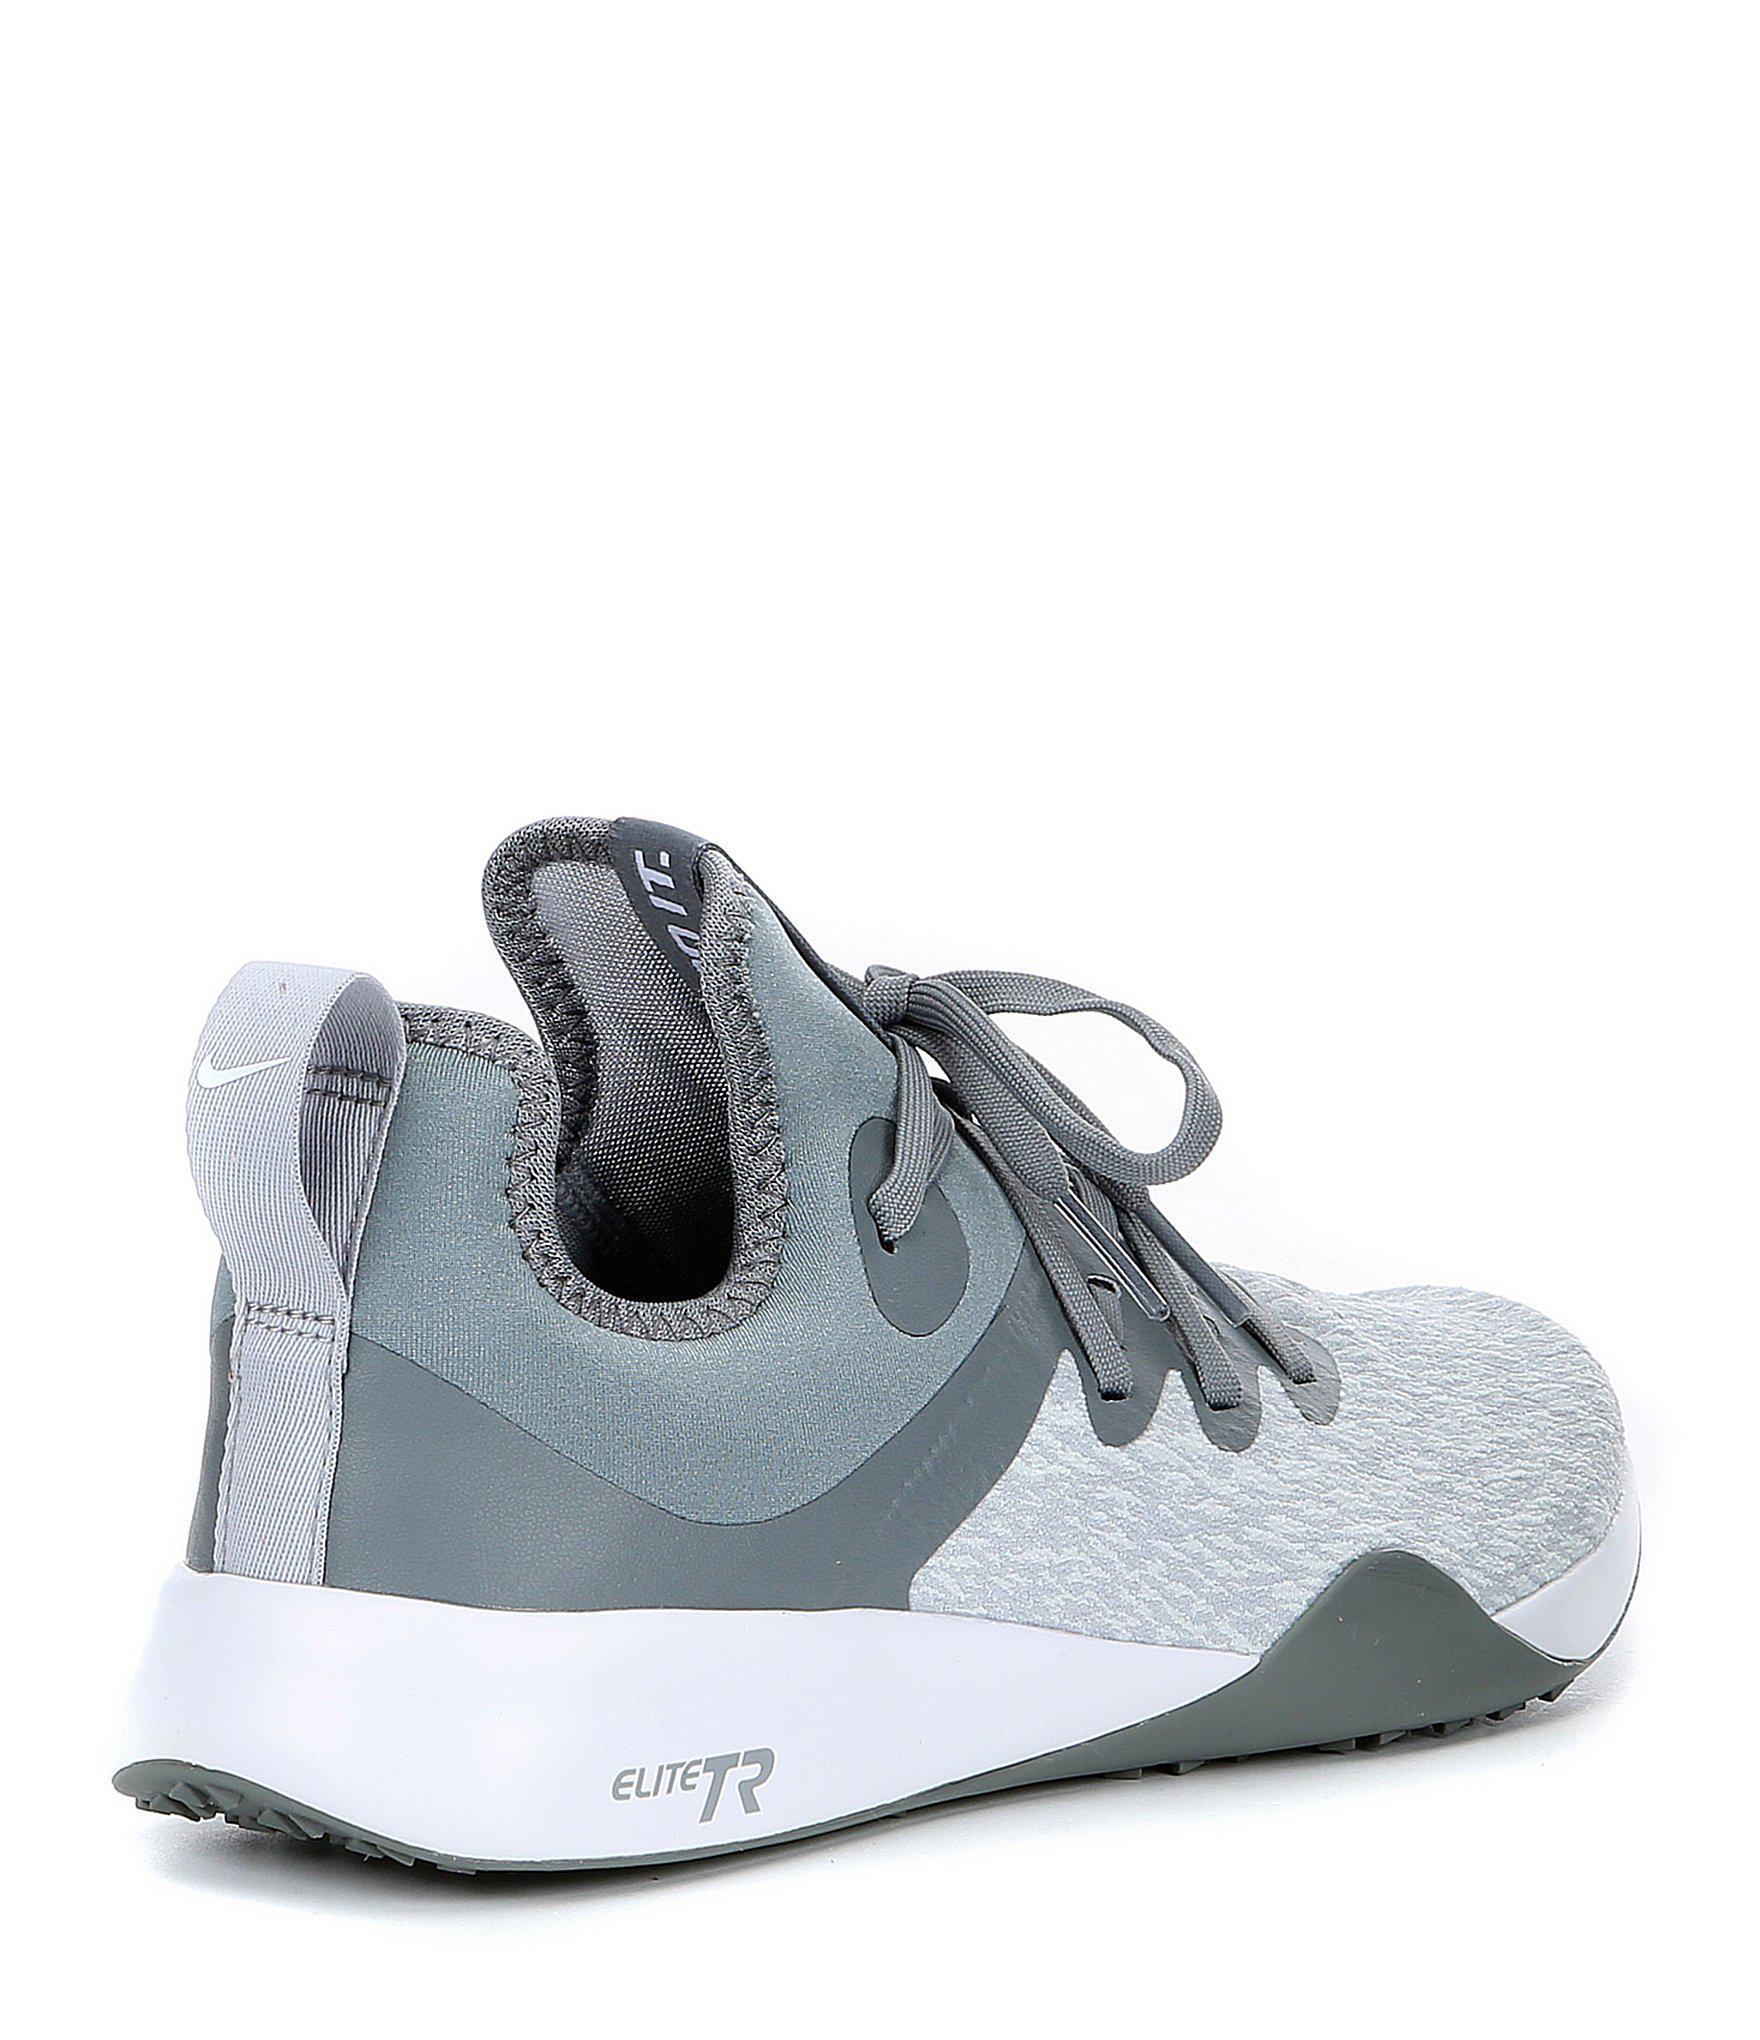 4427d03b0eb9a Nike Gray Women's Foundation Elite Tr Training Shoe